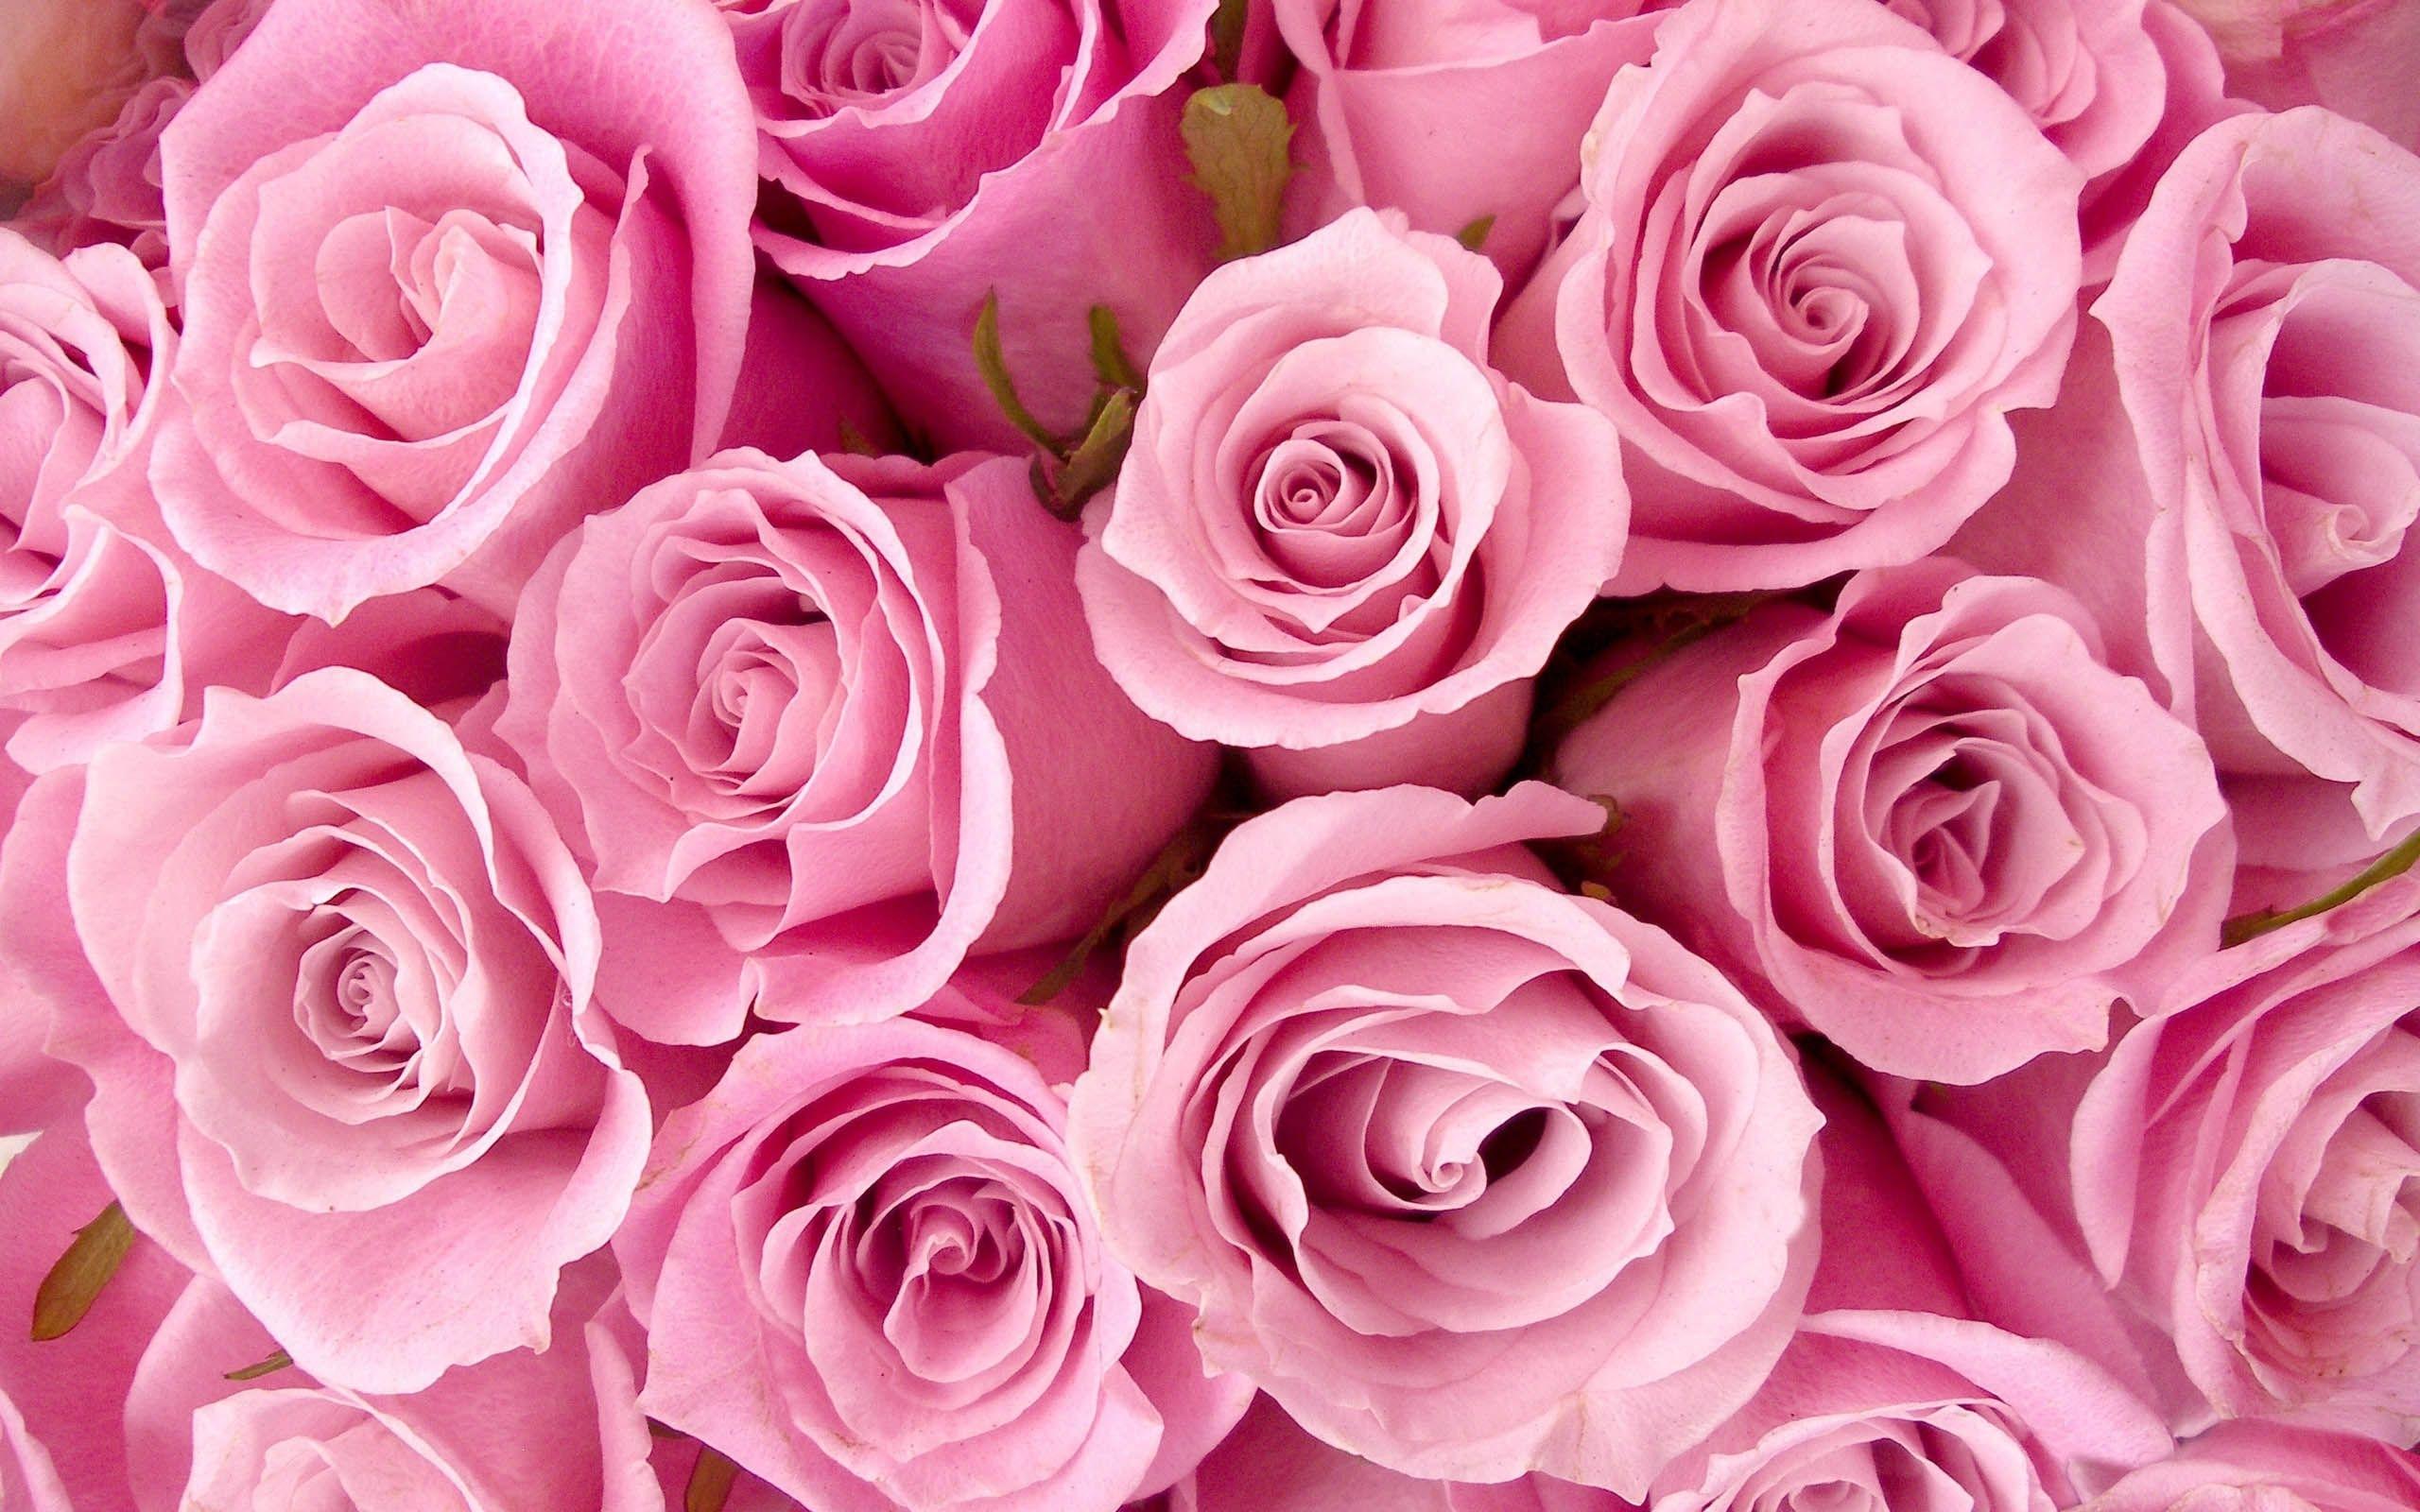 pink roses background wallpaper pink rose backgrounds - wallpaper